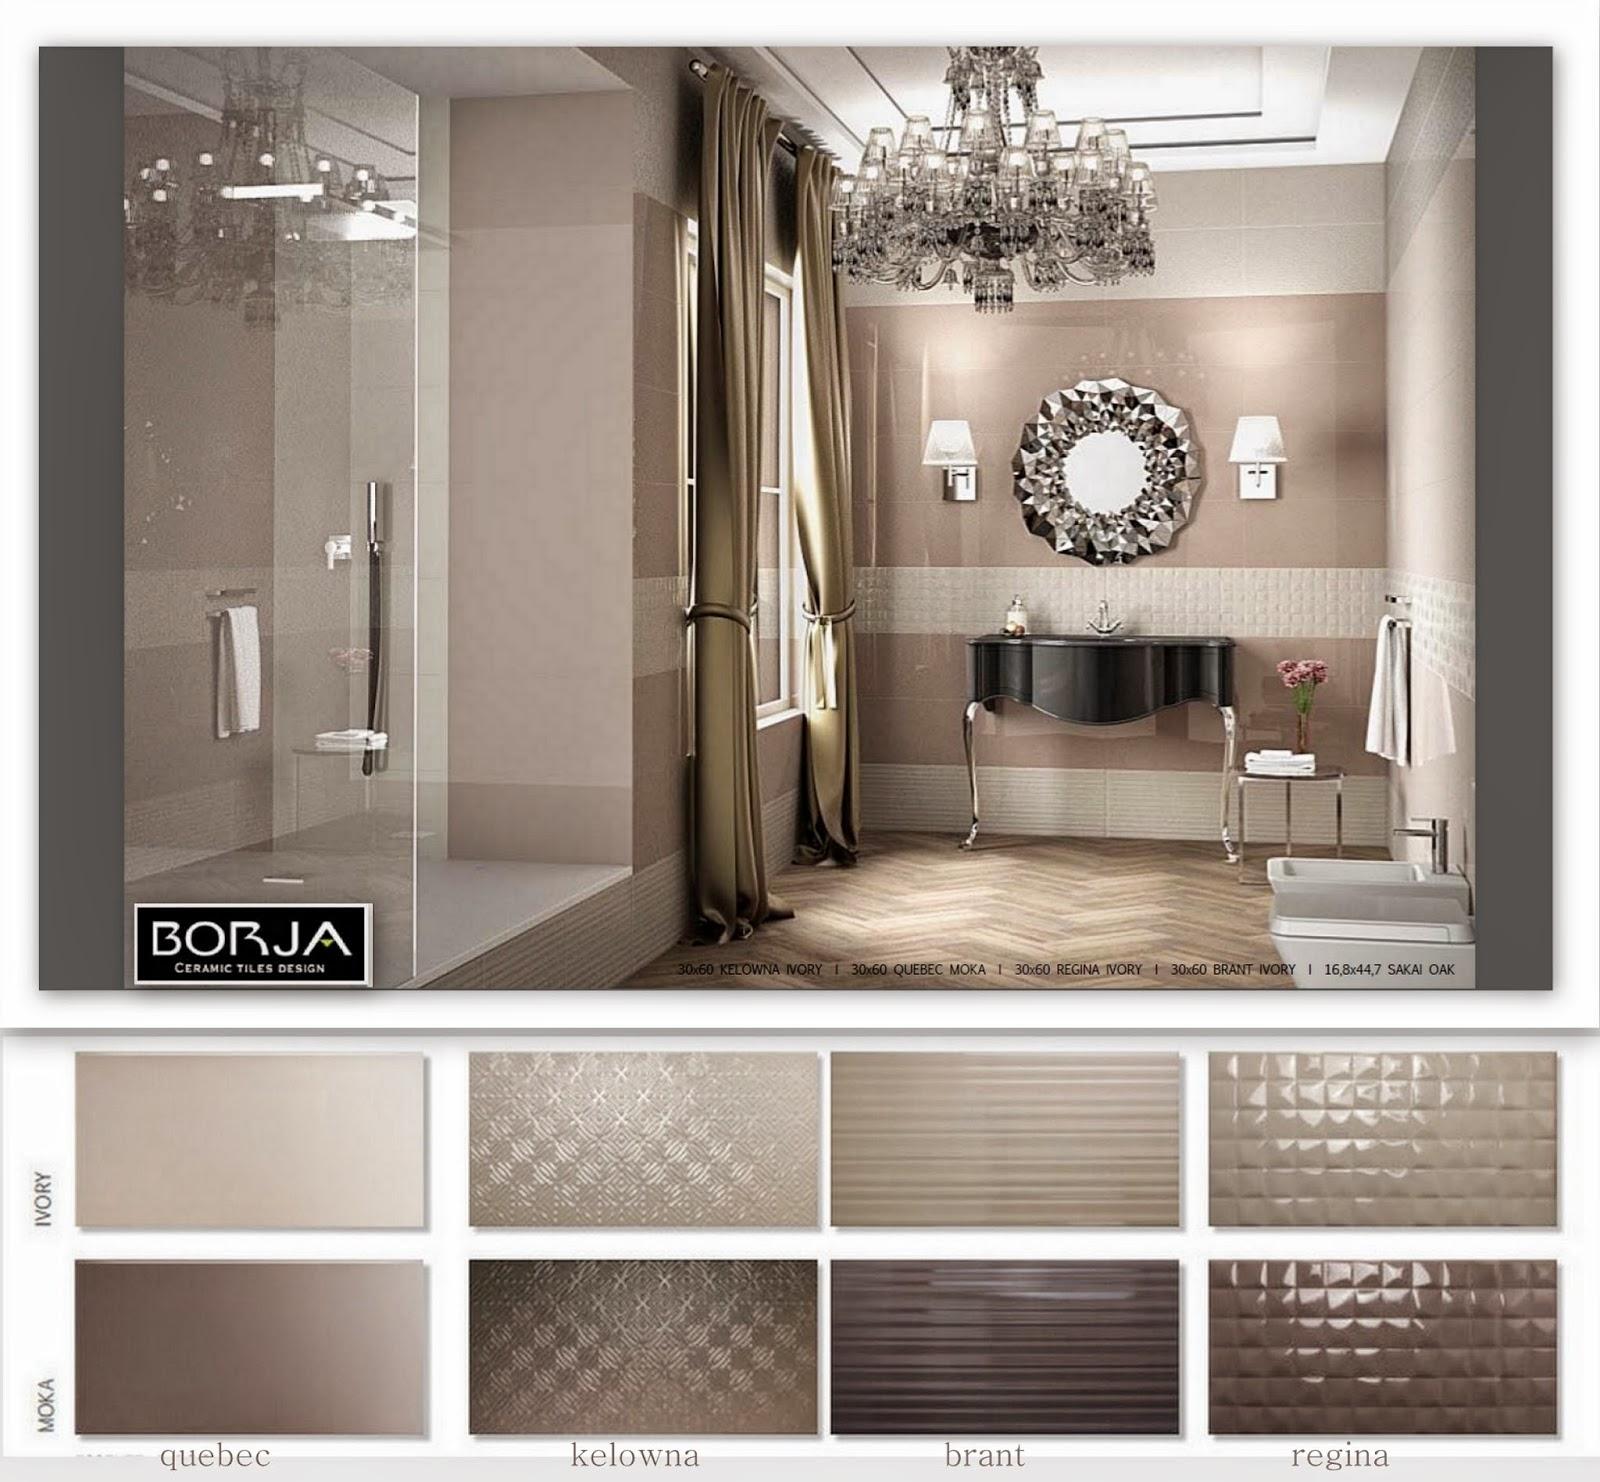 Popular Tile For Bathrooms: BORJA CERAMIC TILES DESIGN : Walls 30x60